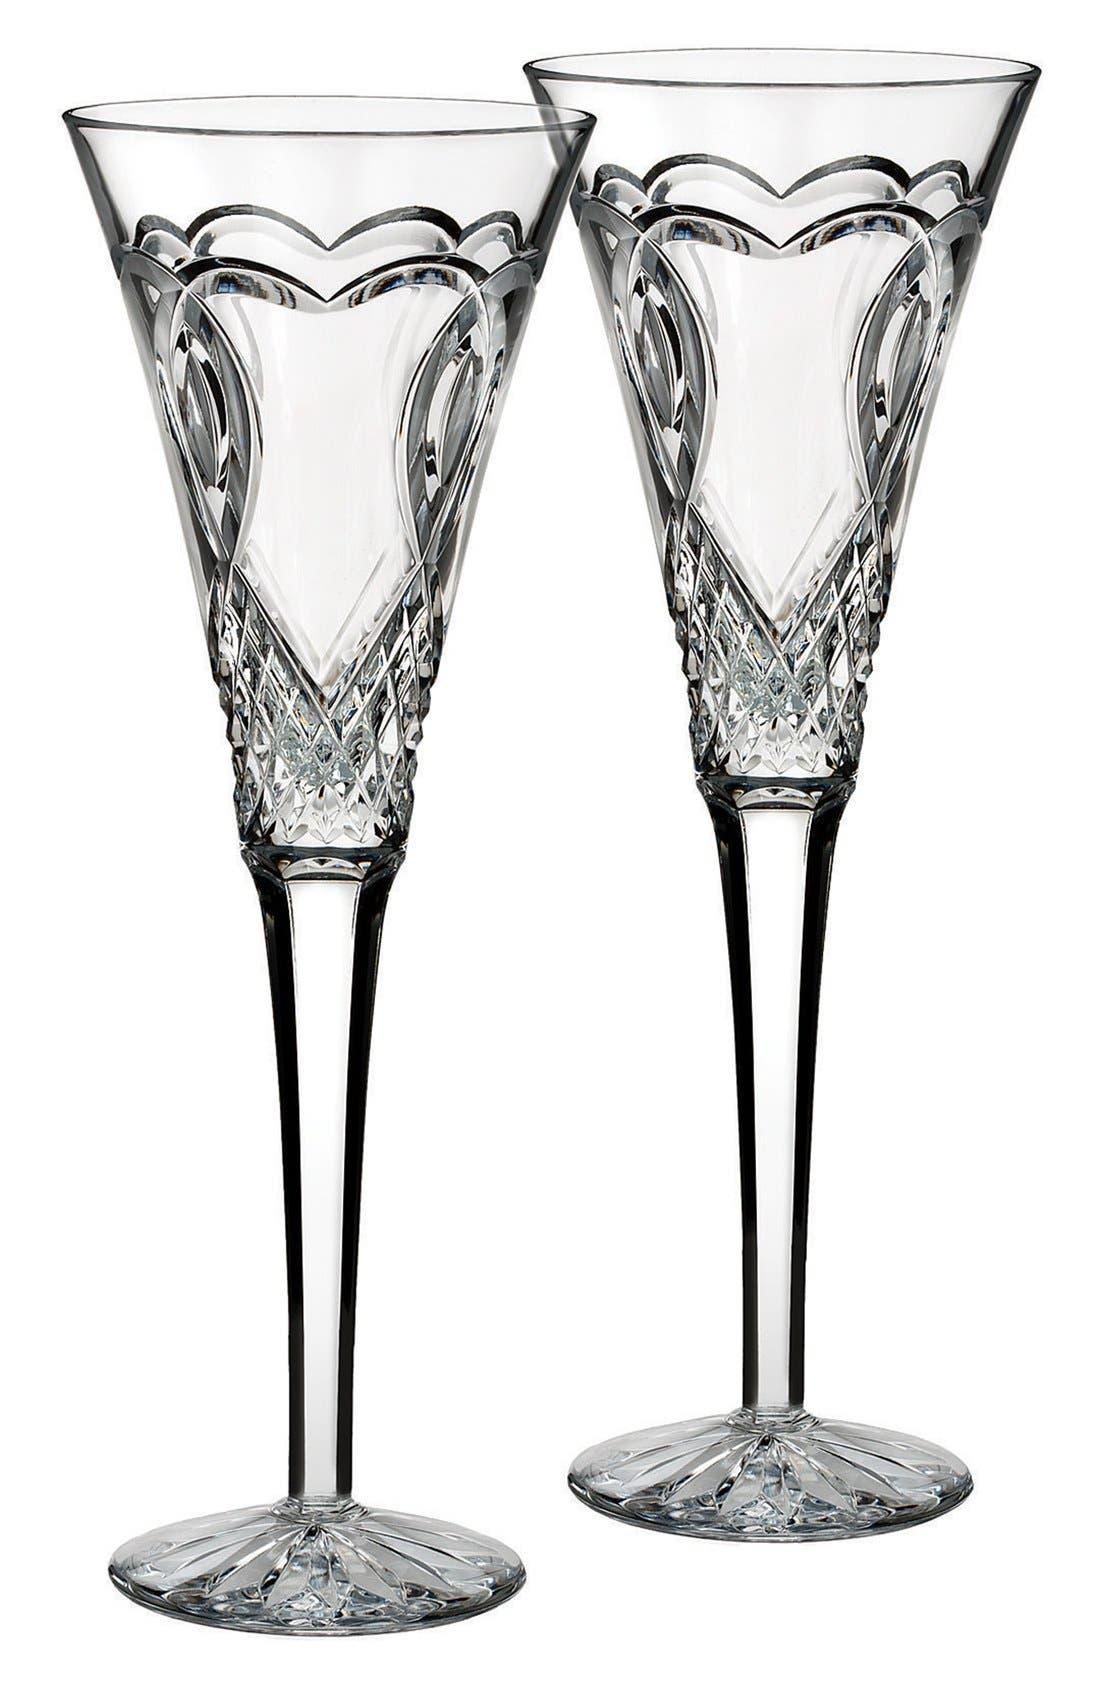 Alternate Image 1 Selected - Waterford 'Wedding' Lead Crystal Toasting Flutes (Set of 2)